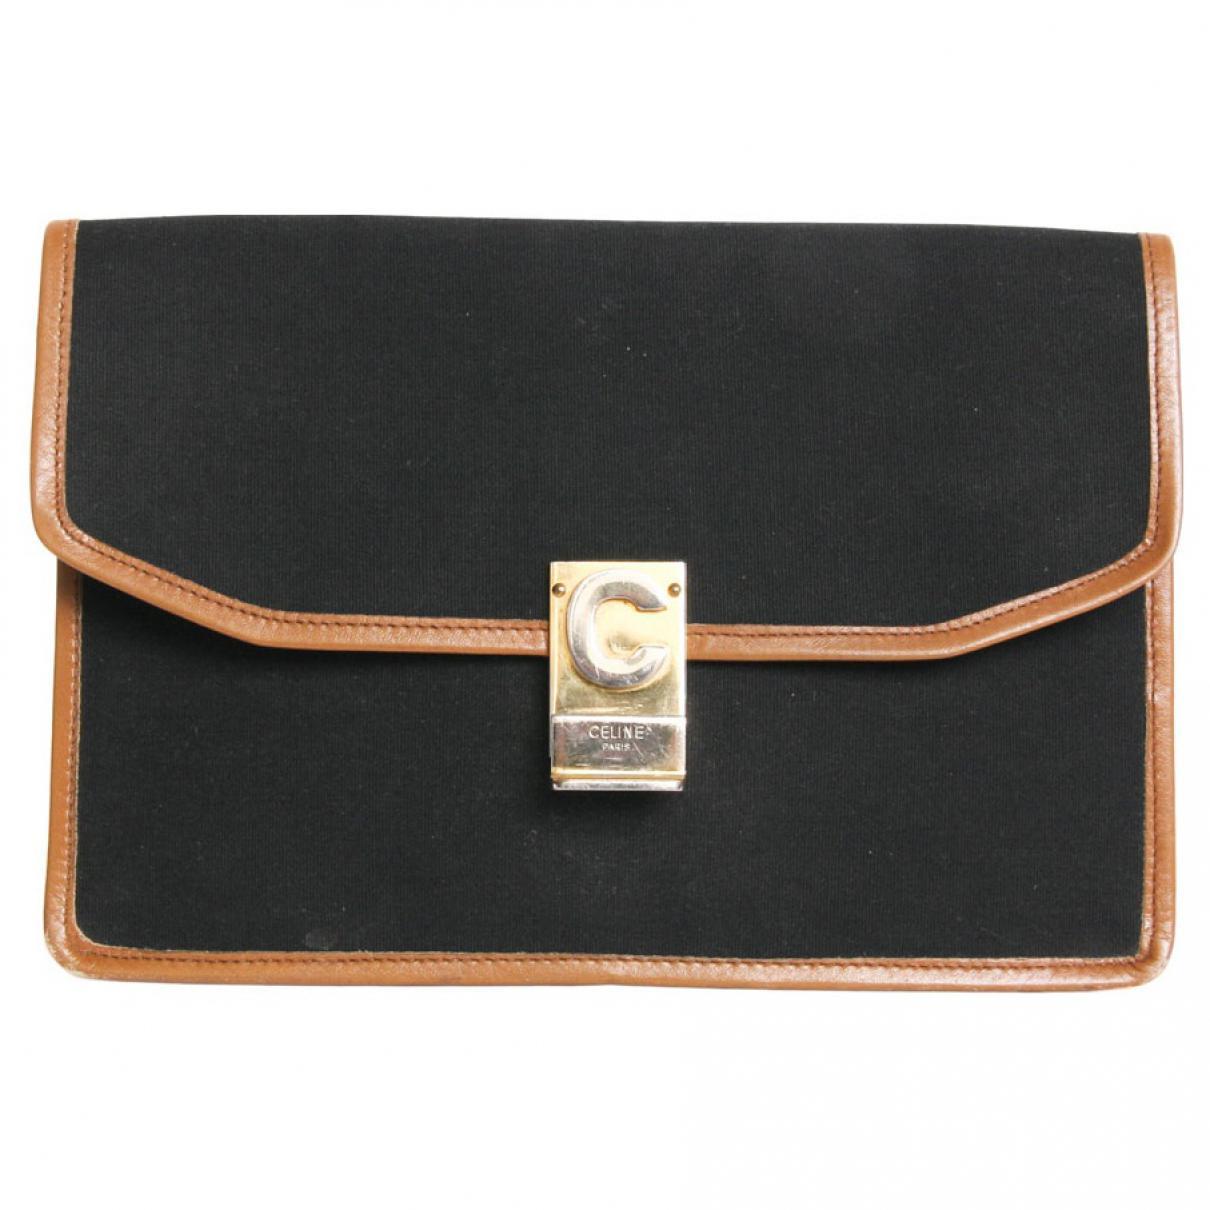 Pre-owned - Cloth clutch bag Celine Hm7BhcTo1